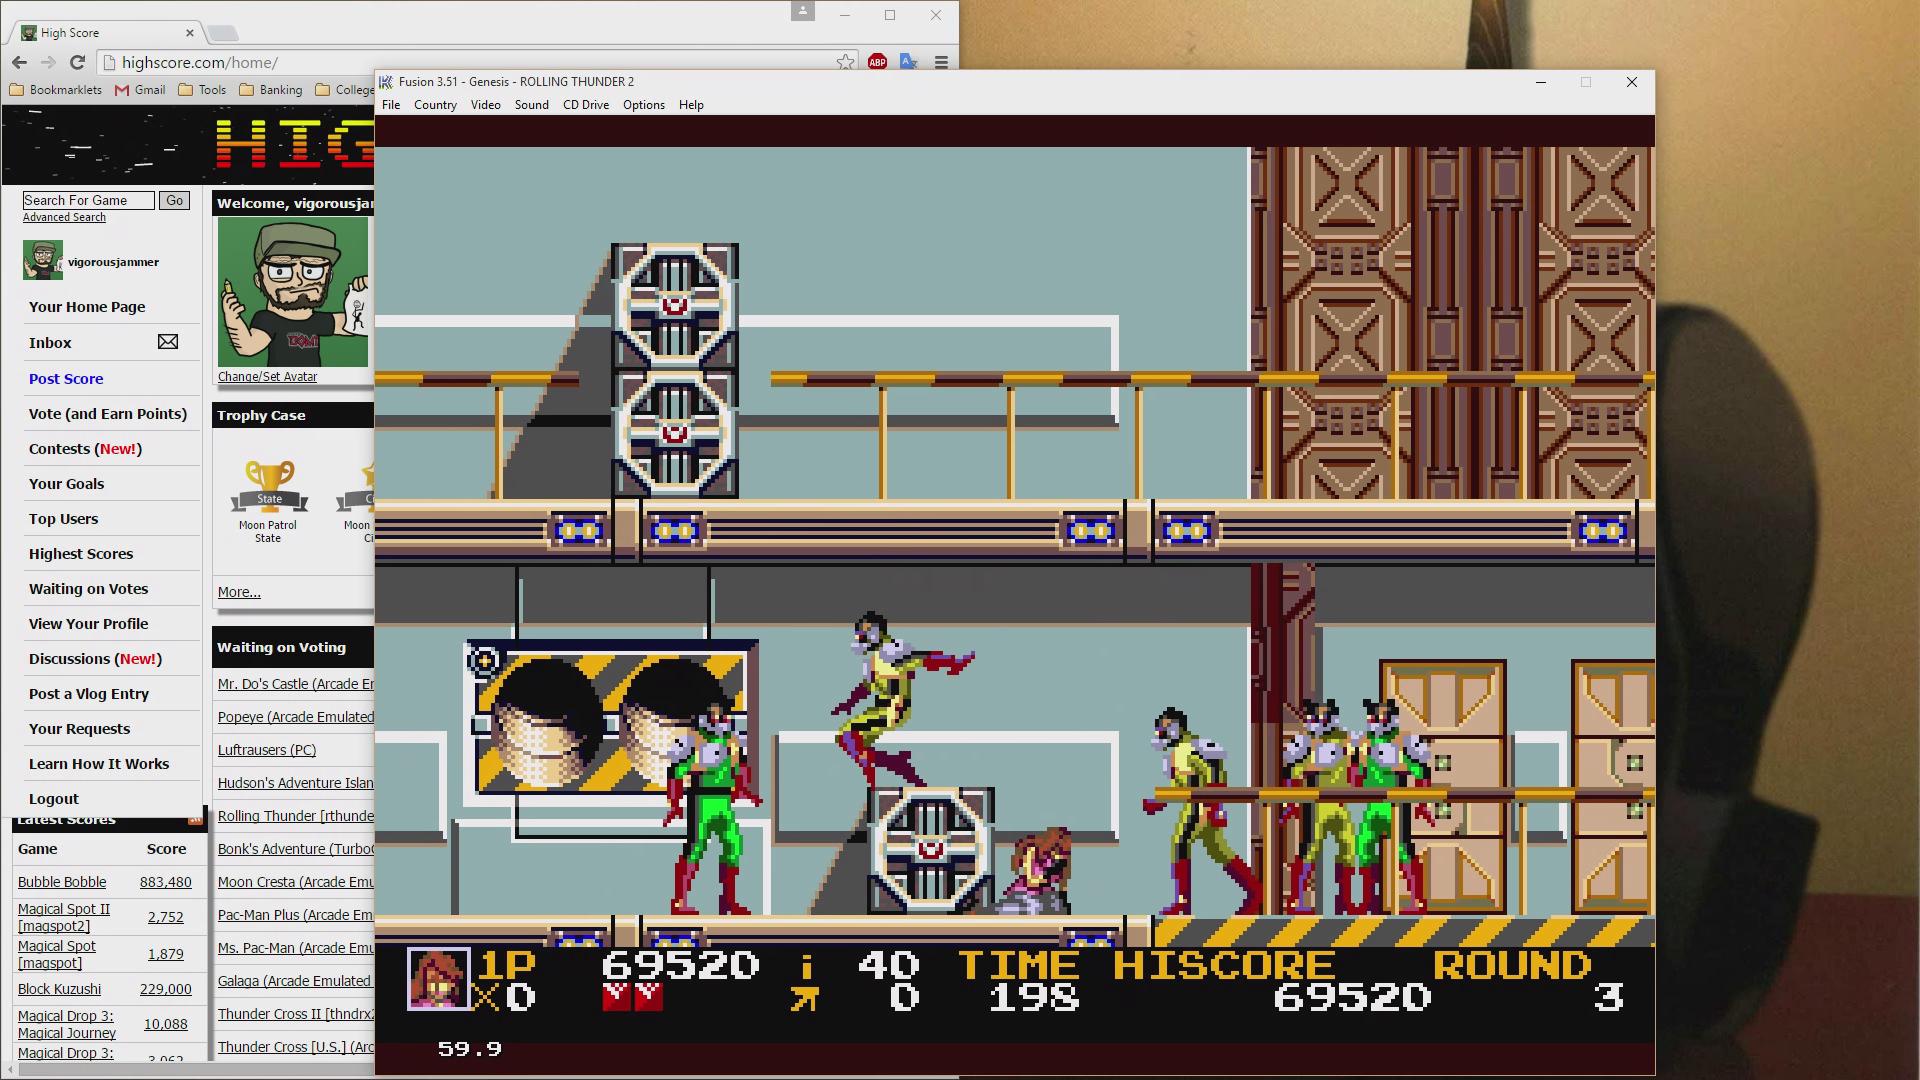 vigorousjammer: Rolling Thunder 2 (Sega Genesis / MegaDrive Emulated) 69,520 points on 2015-08-27 19:01:58